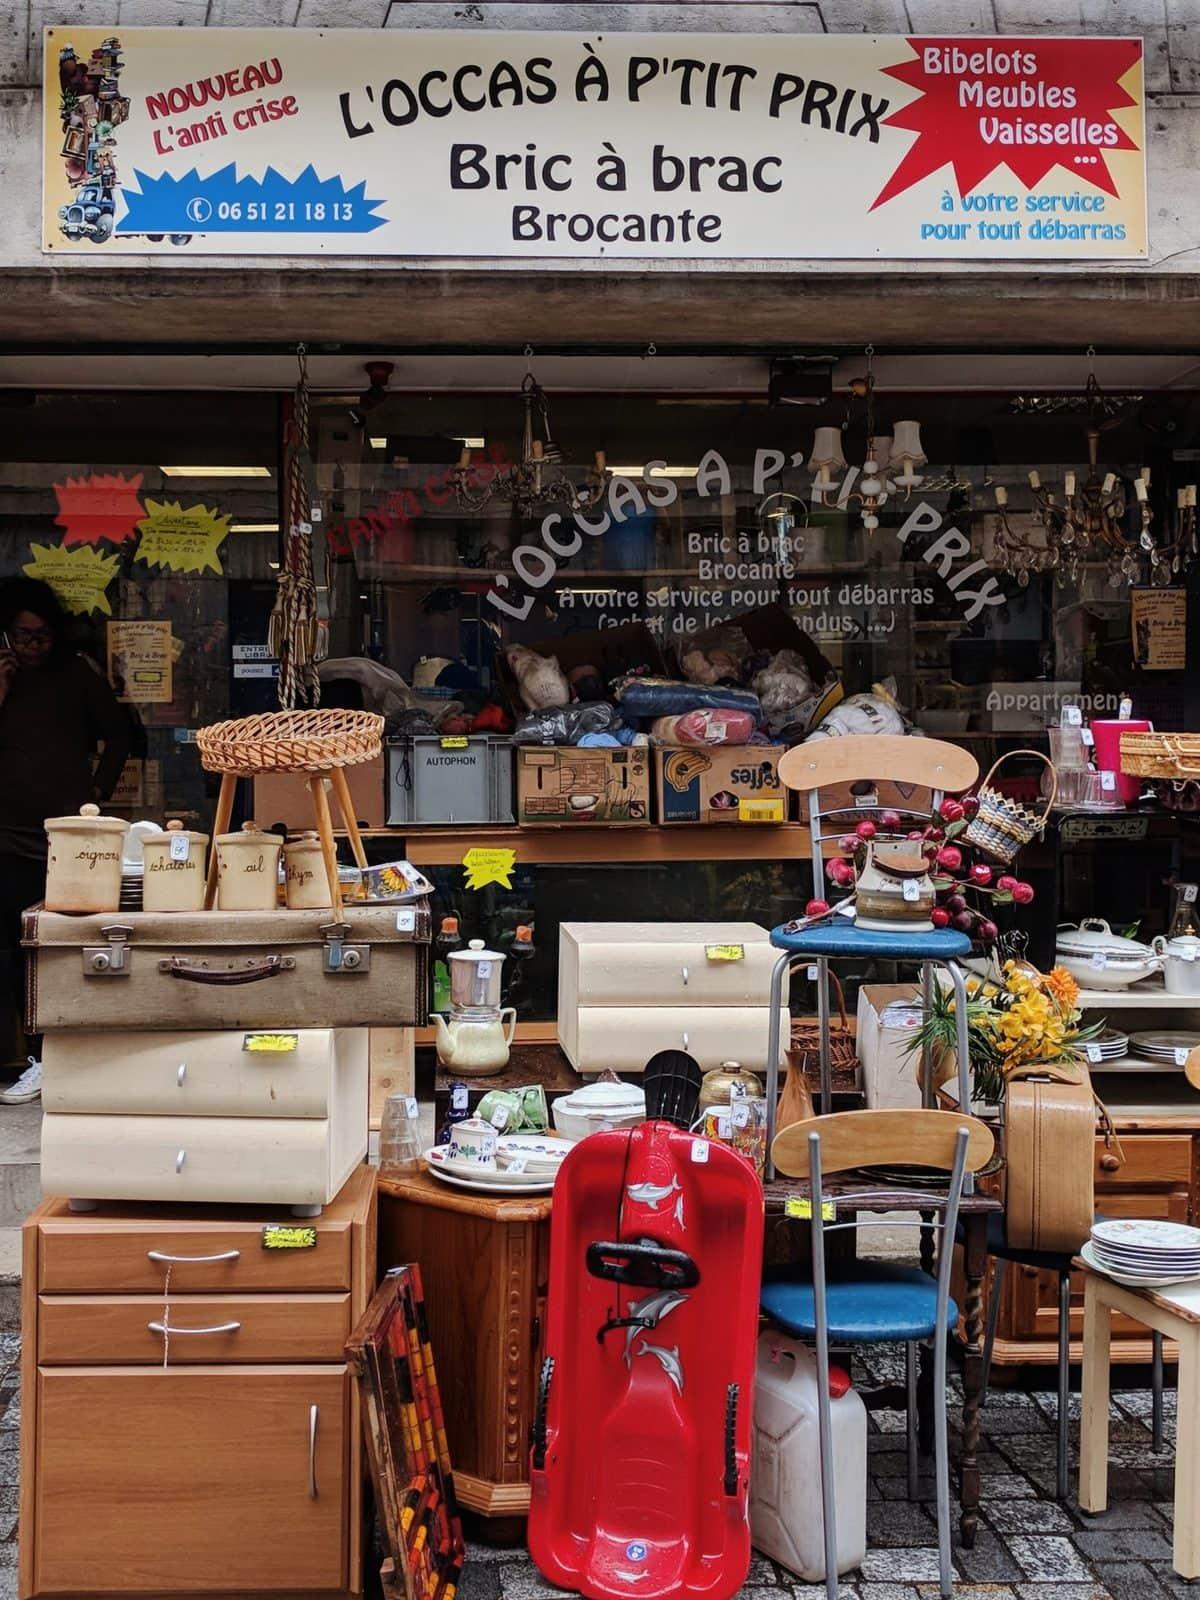 L'ocass a petit prix bric a brac - Besançon antique shop